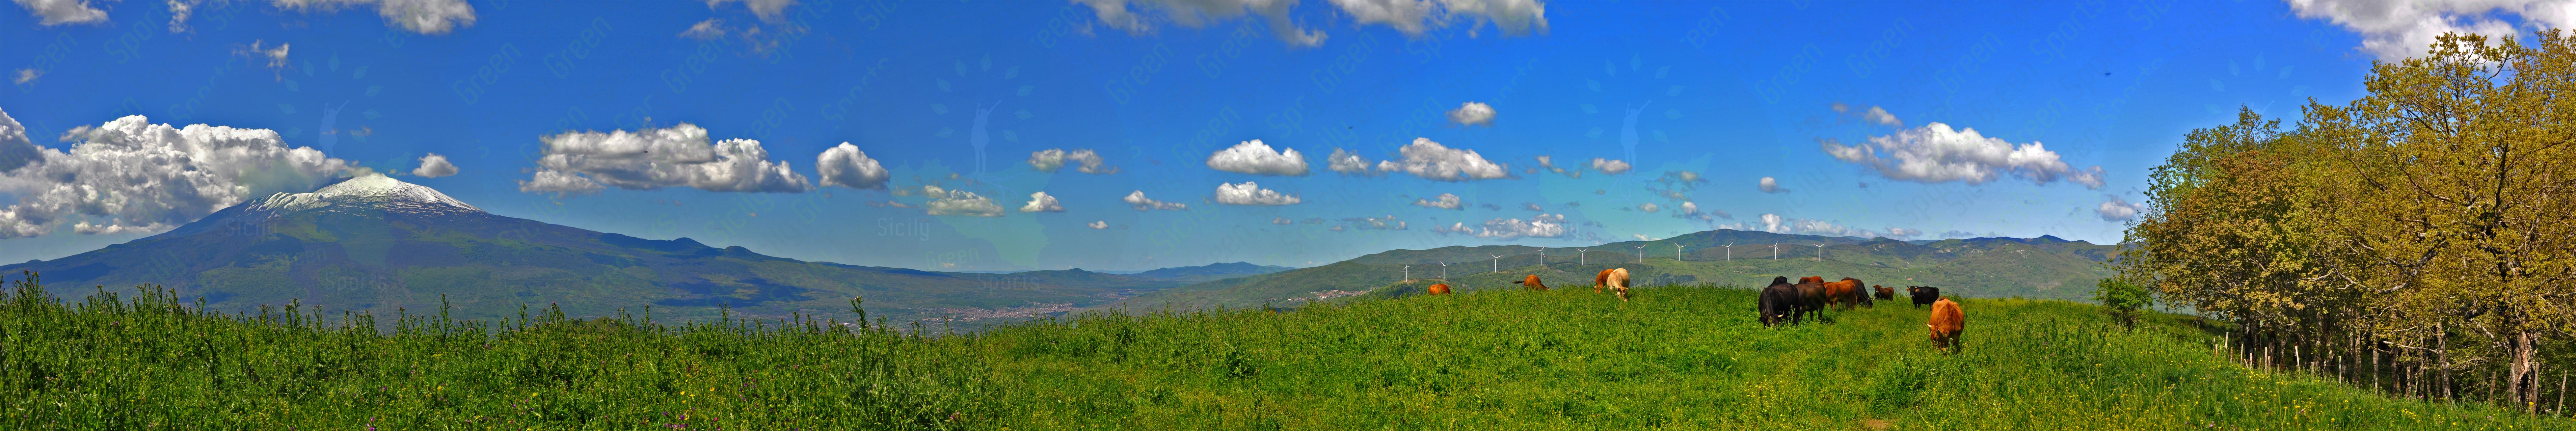 panorama sulla etna e l 'alta valle alcantara